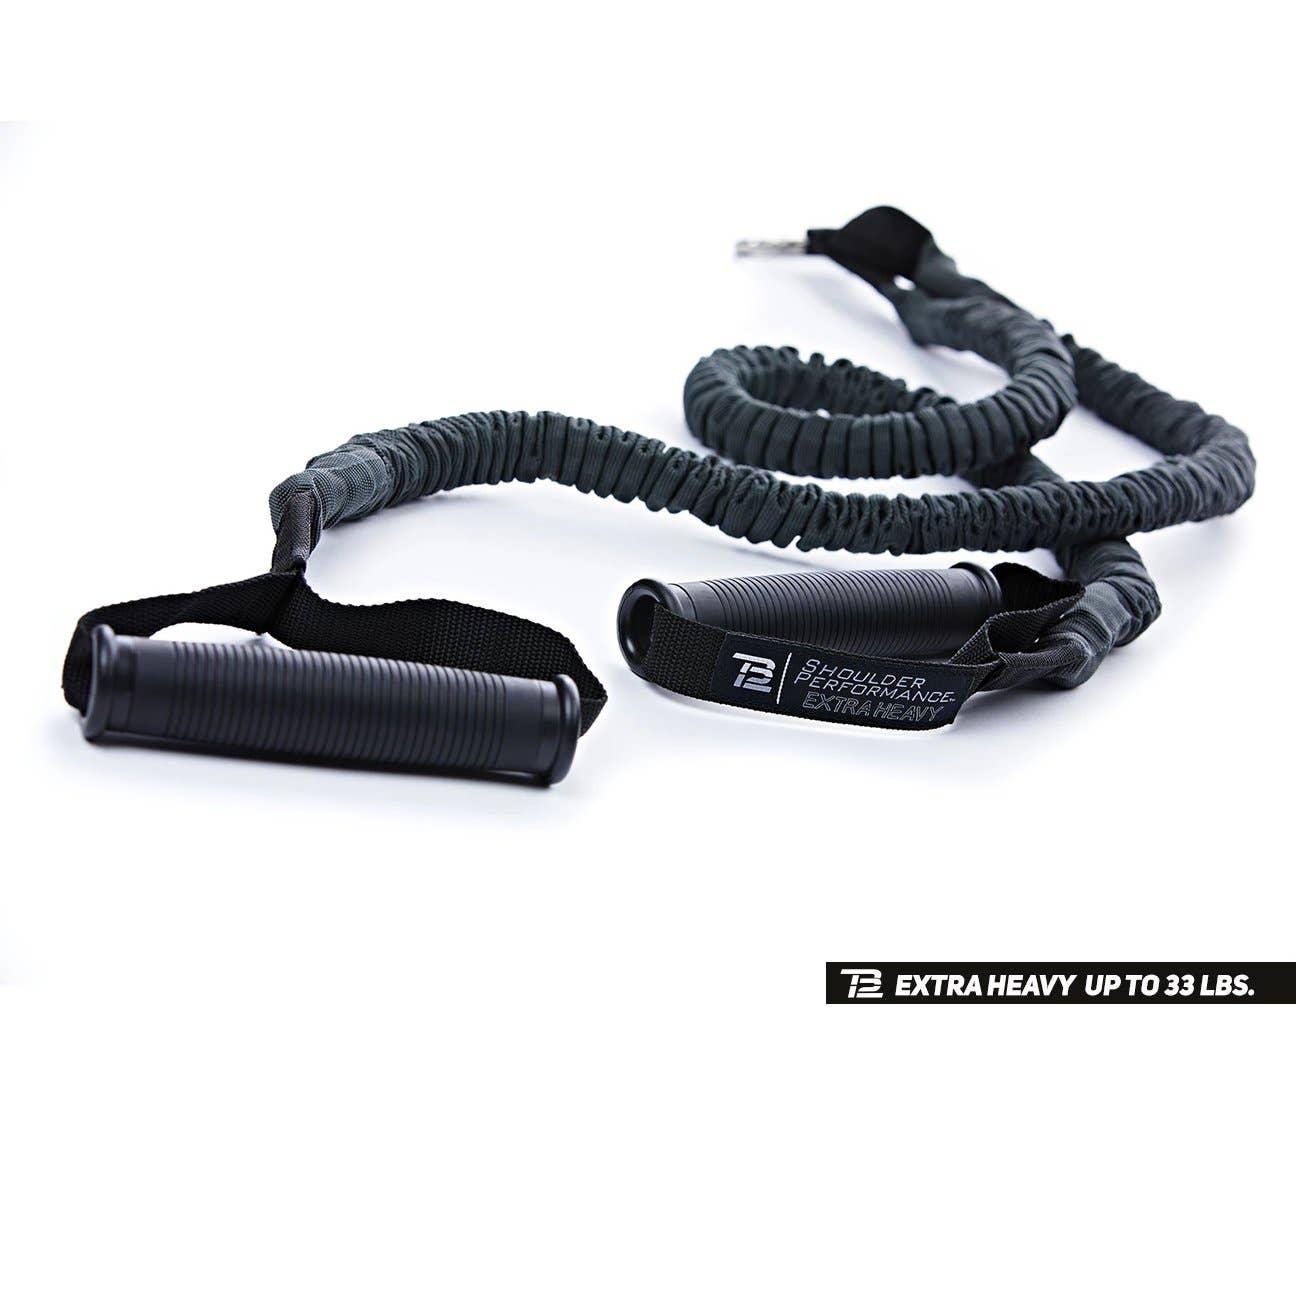 TB12™ Handle Resistance Band Kit